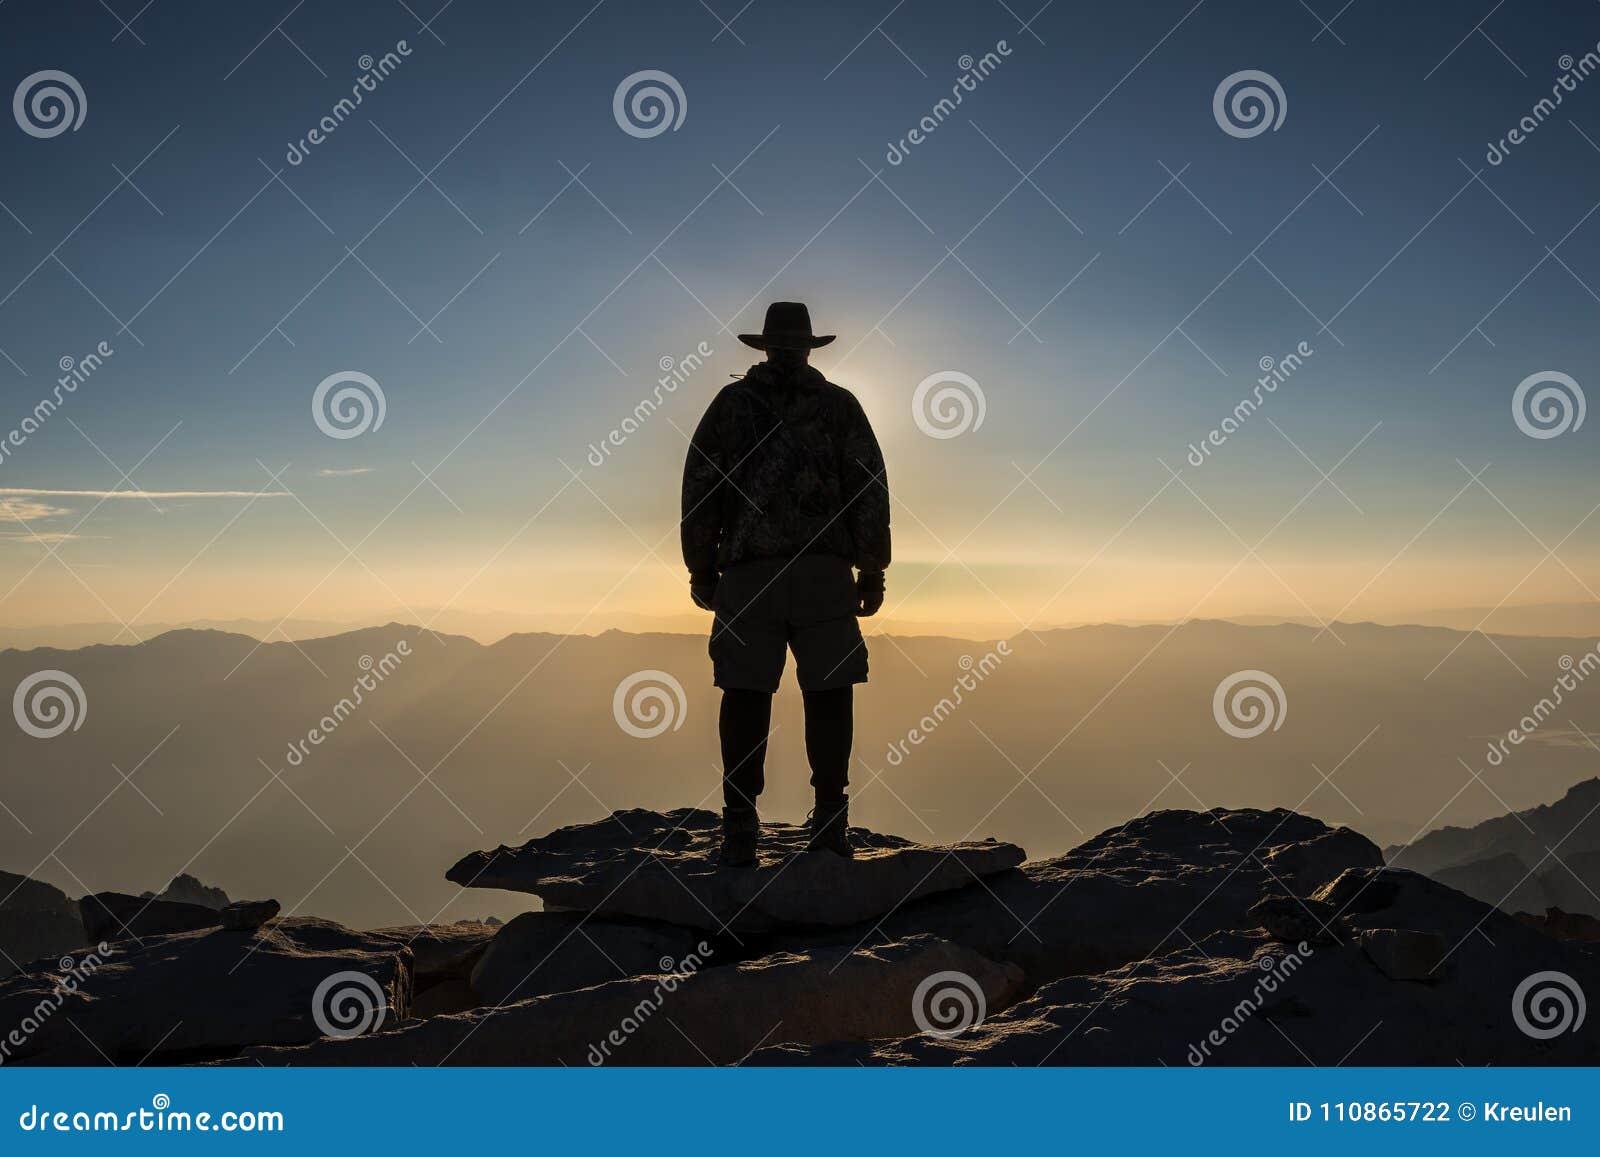 De-La Sierra Nevada, Gipfel EL Jefe von Mt Whitney